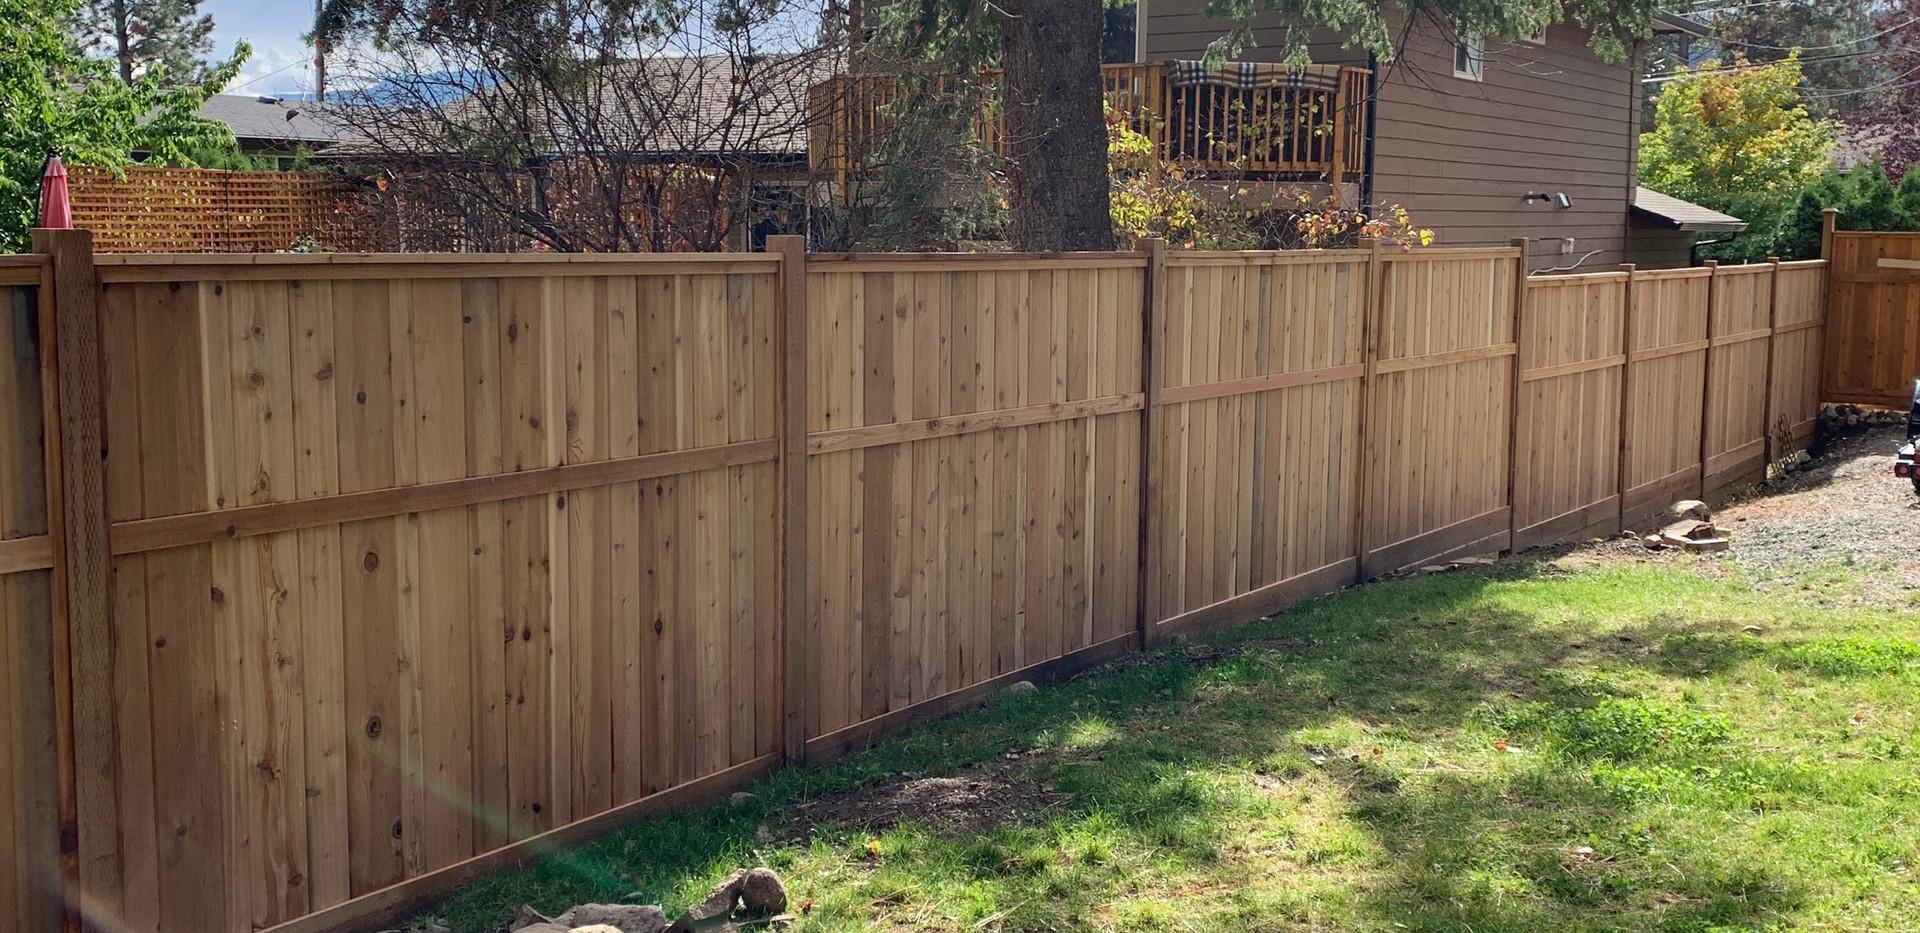 Vertical cedar fence